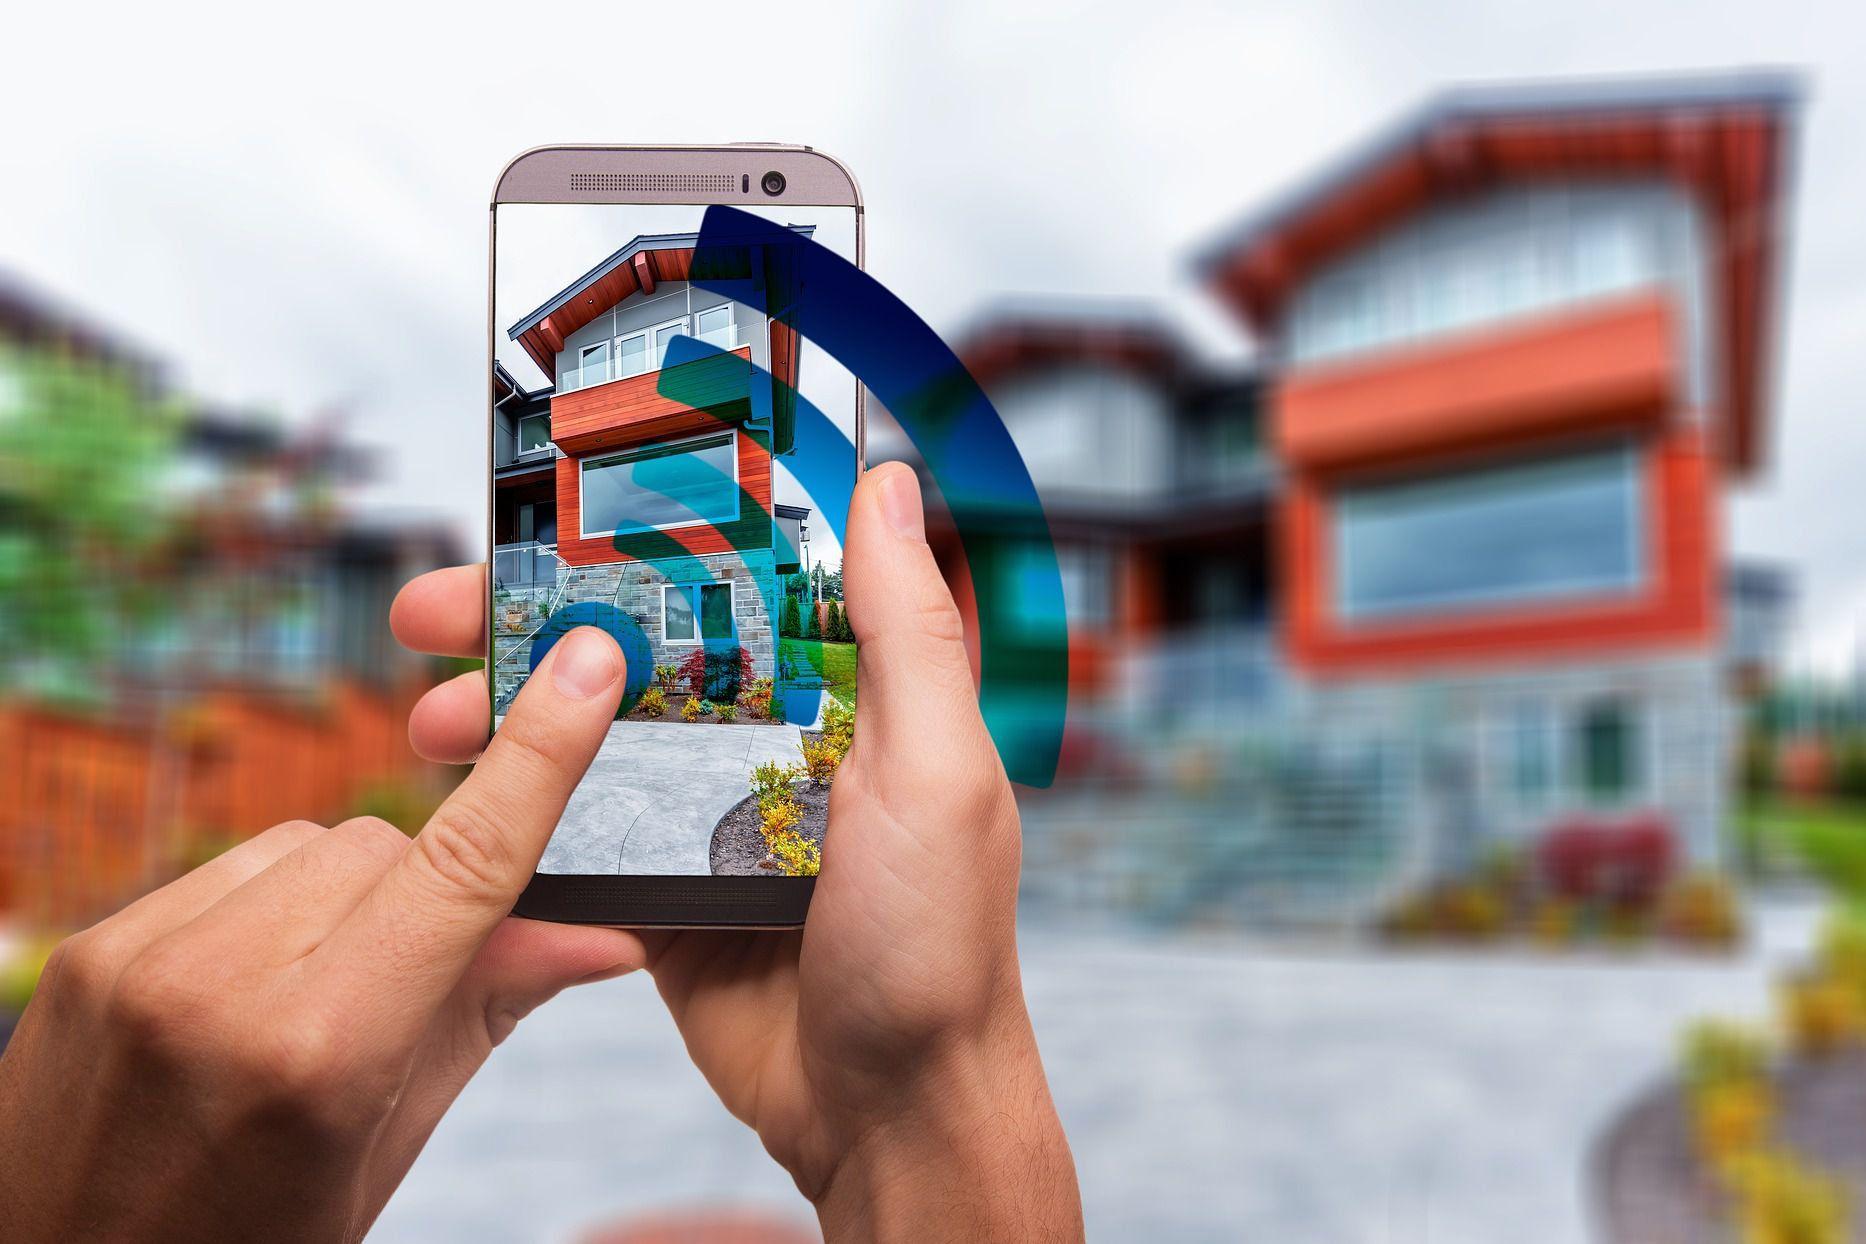 Best Realtor Apps 2019 The 6 Best Housing Apps of 2019